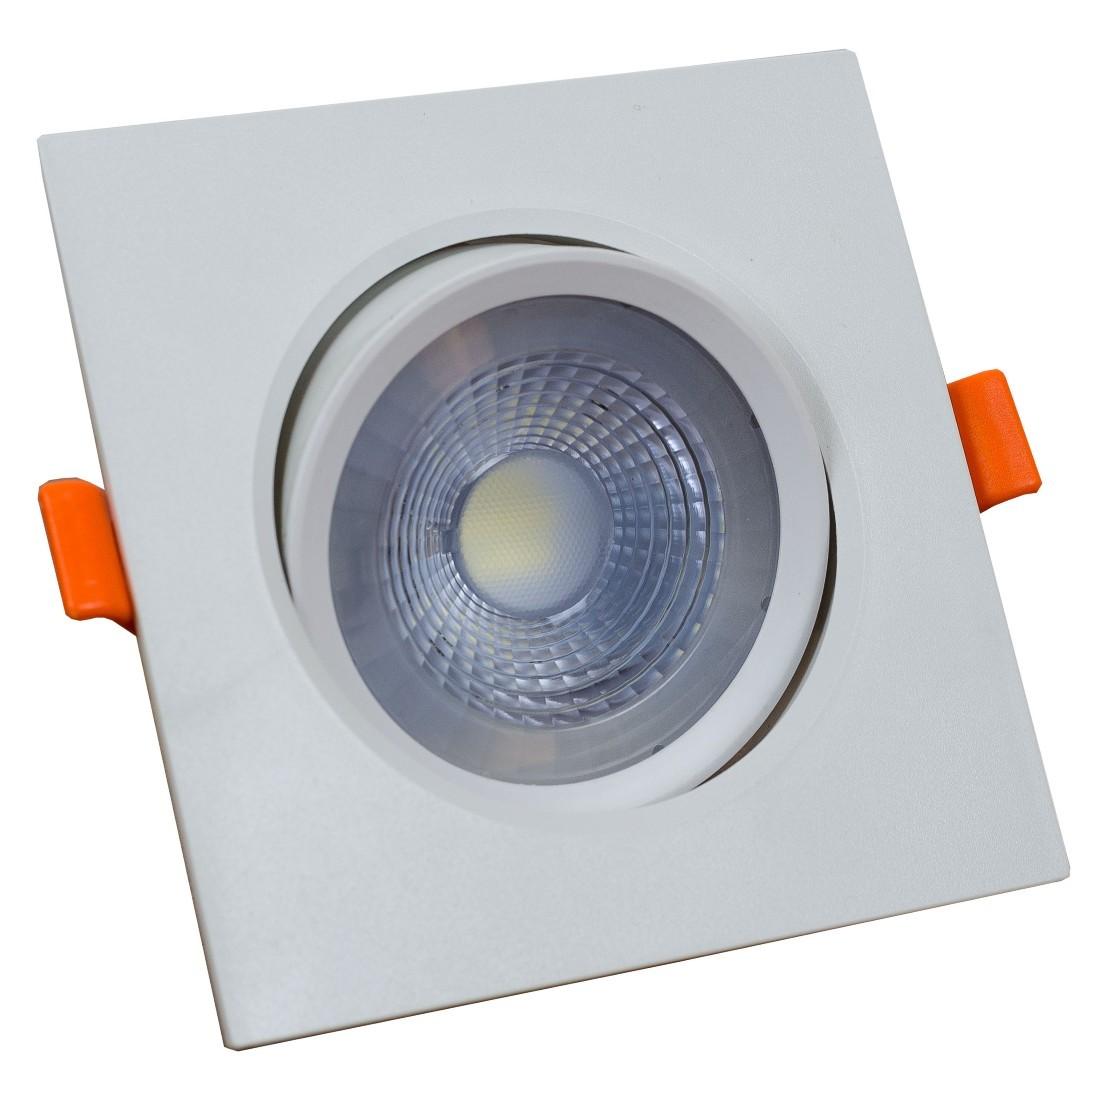 Spot LED Embutir ABS Quadrado 7W Branco Bivolt - Llum